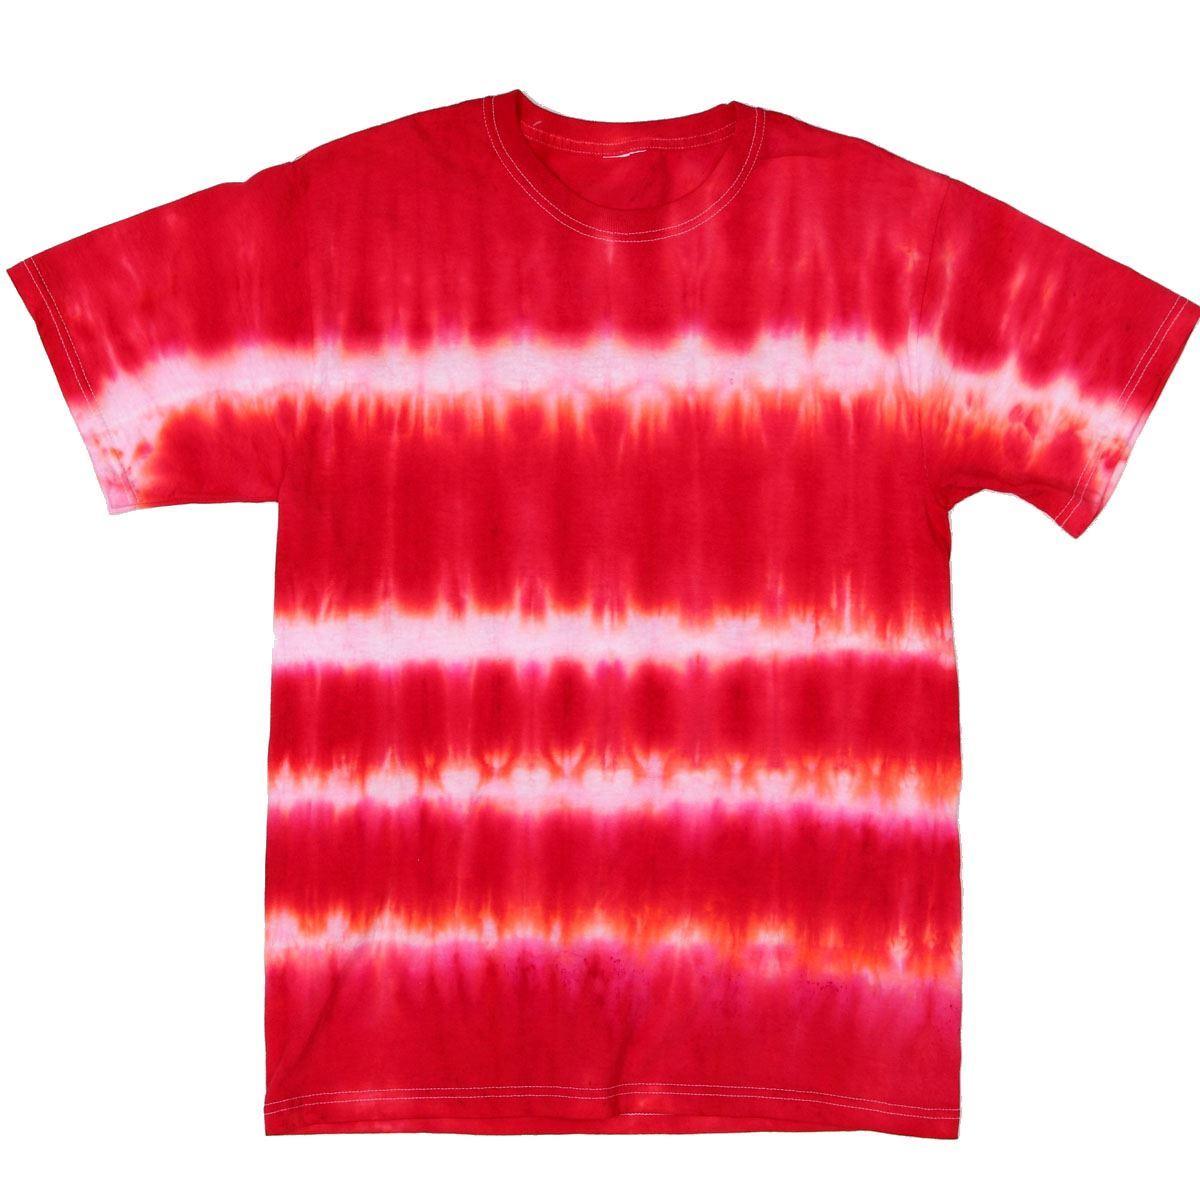 Red Tie Dye T-shirt